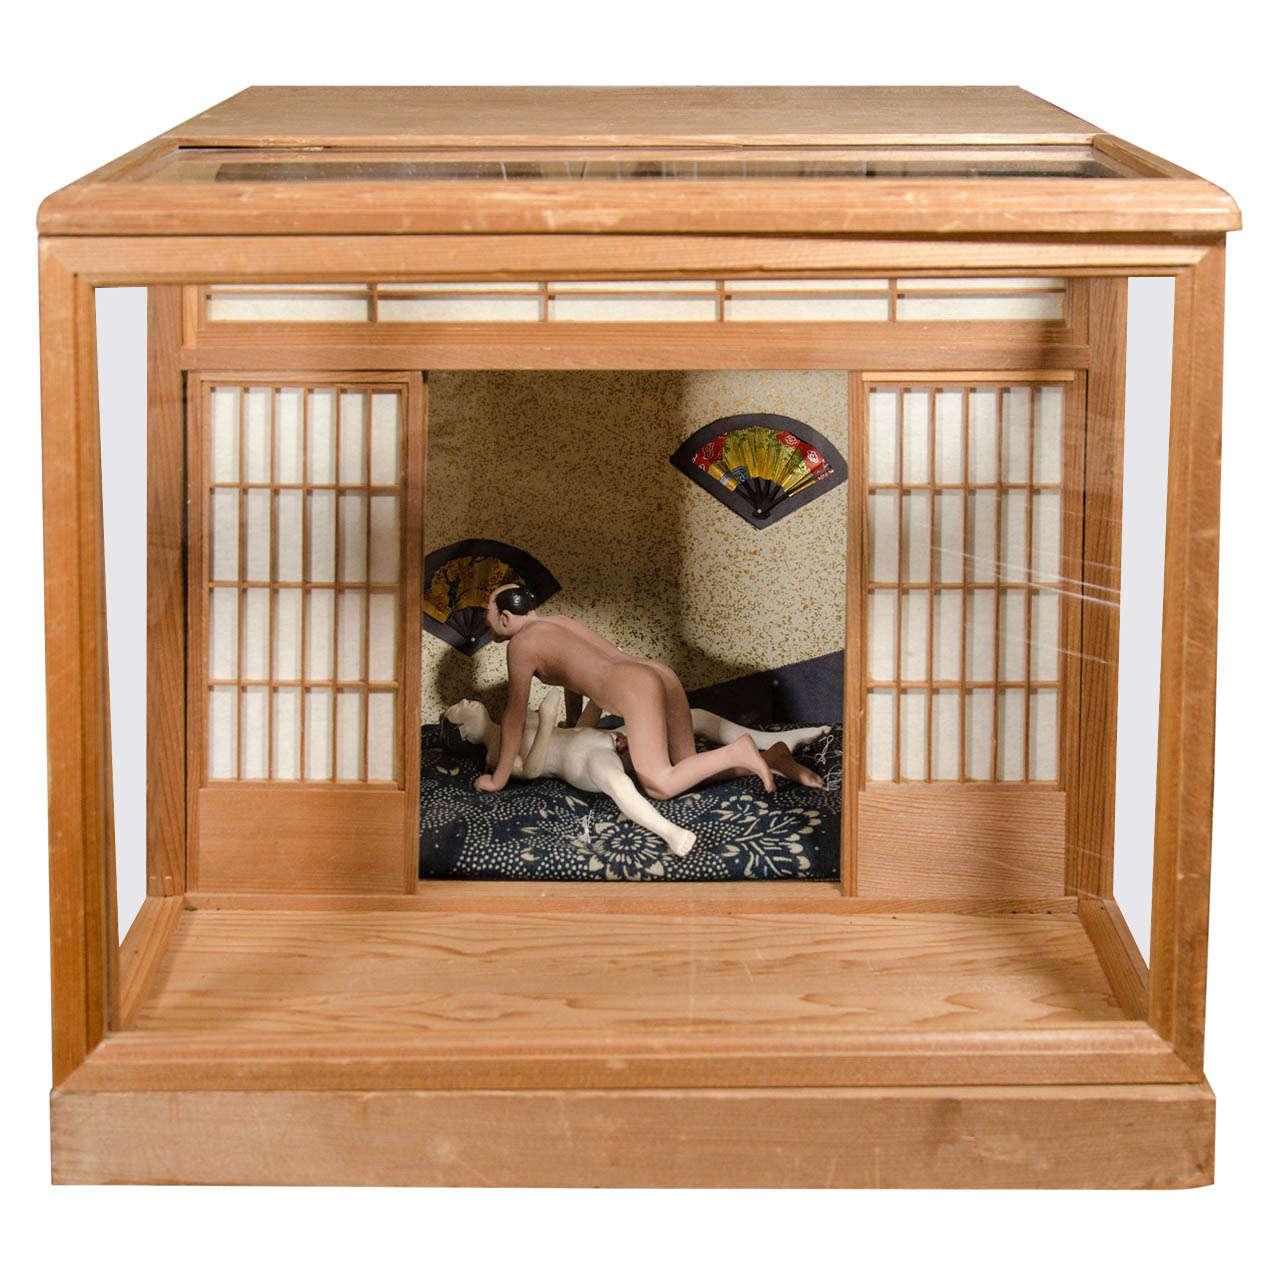 a japanese erotic or shunga ningyo light box from the